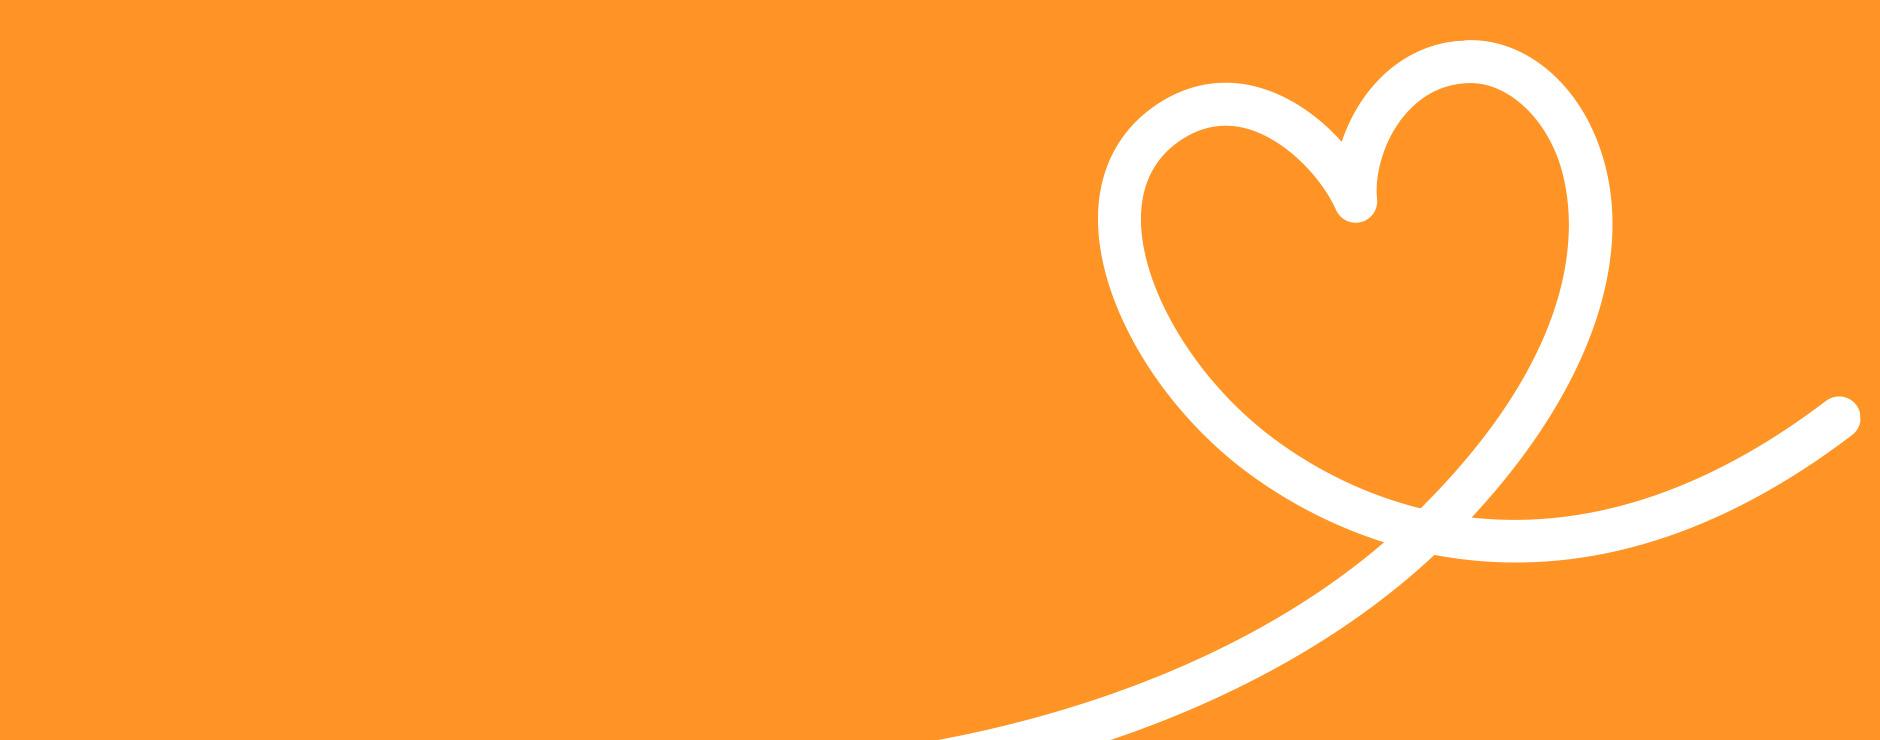 APWU Health Plan all heart badge